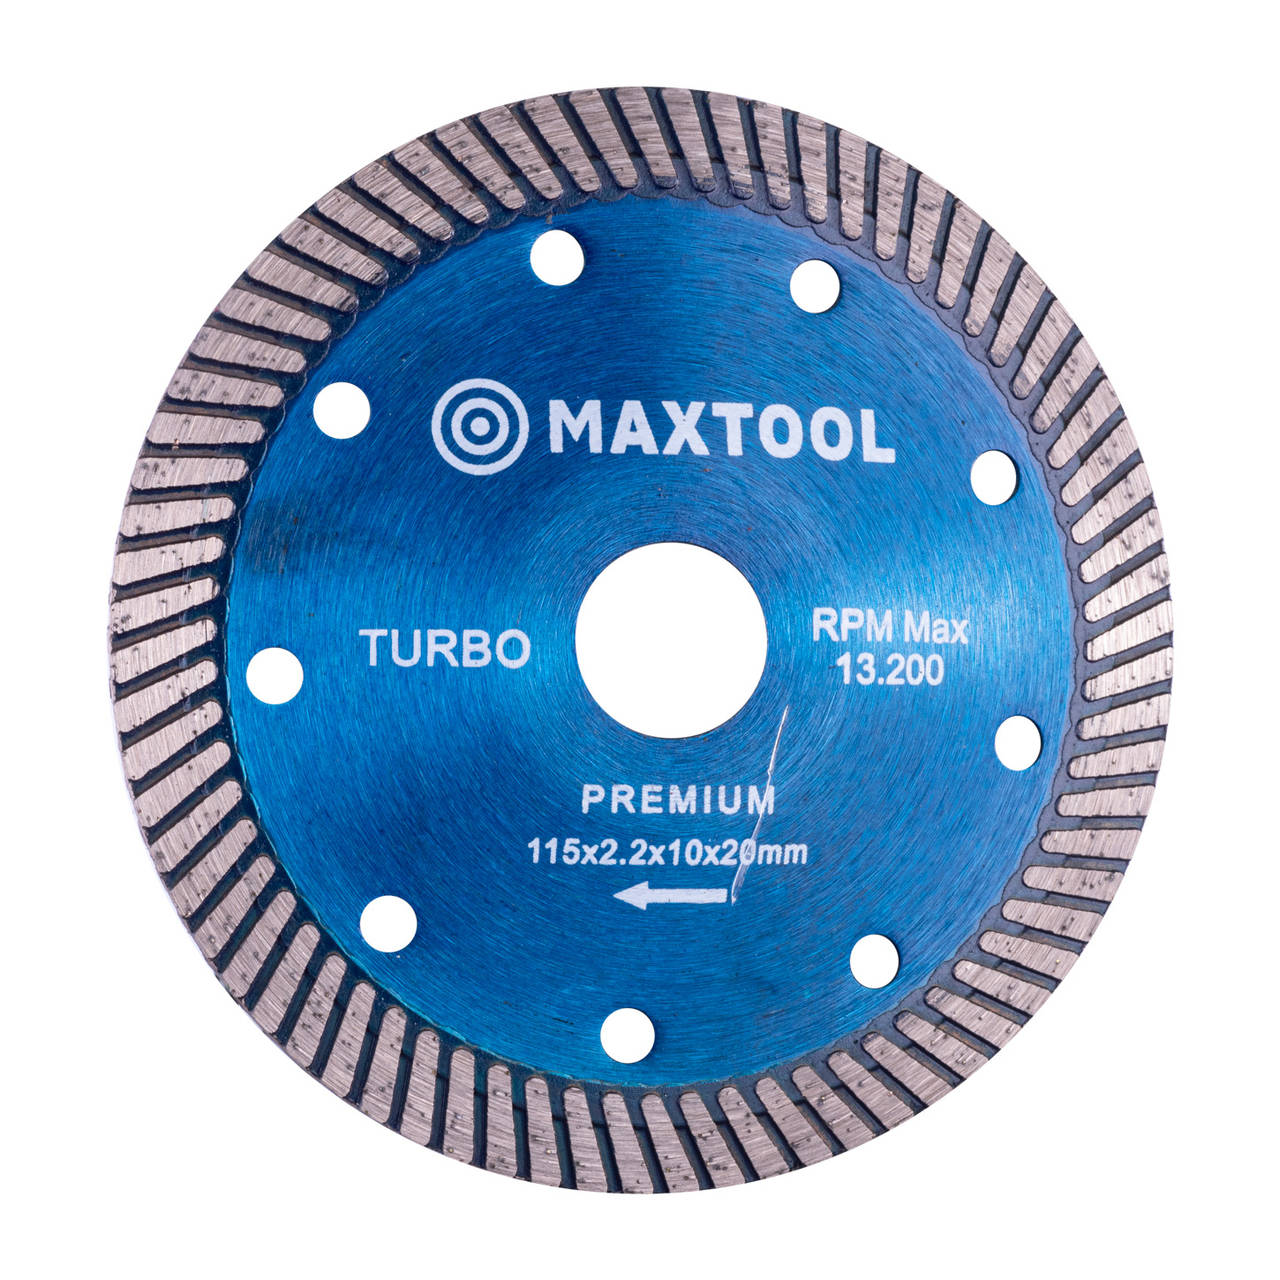 Disco diamantado turbo concavo 115mm Maxtool